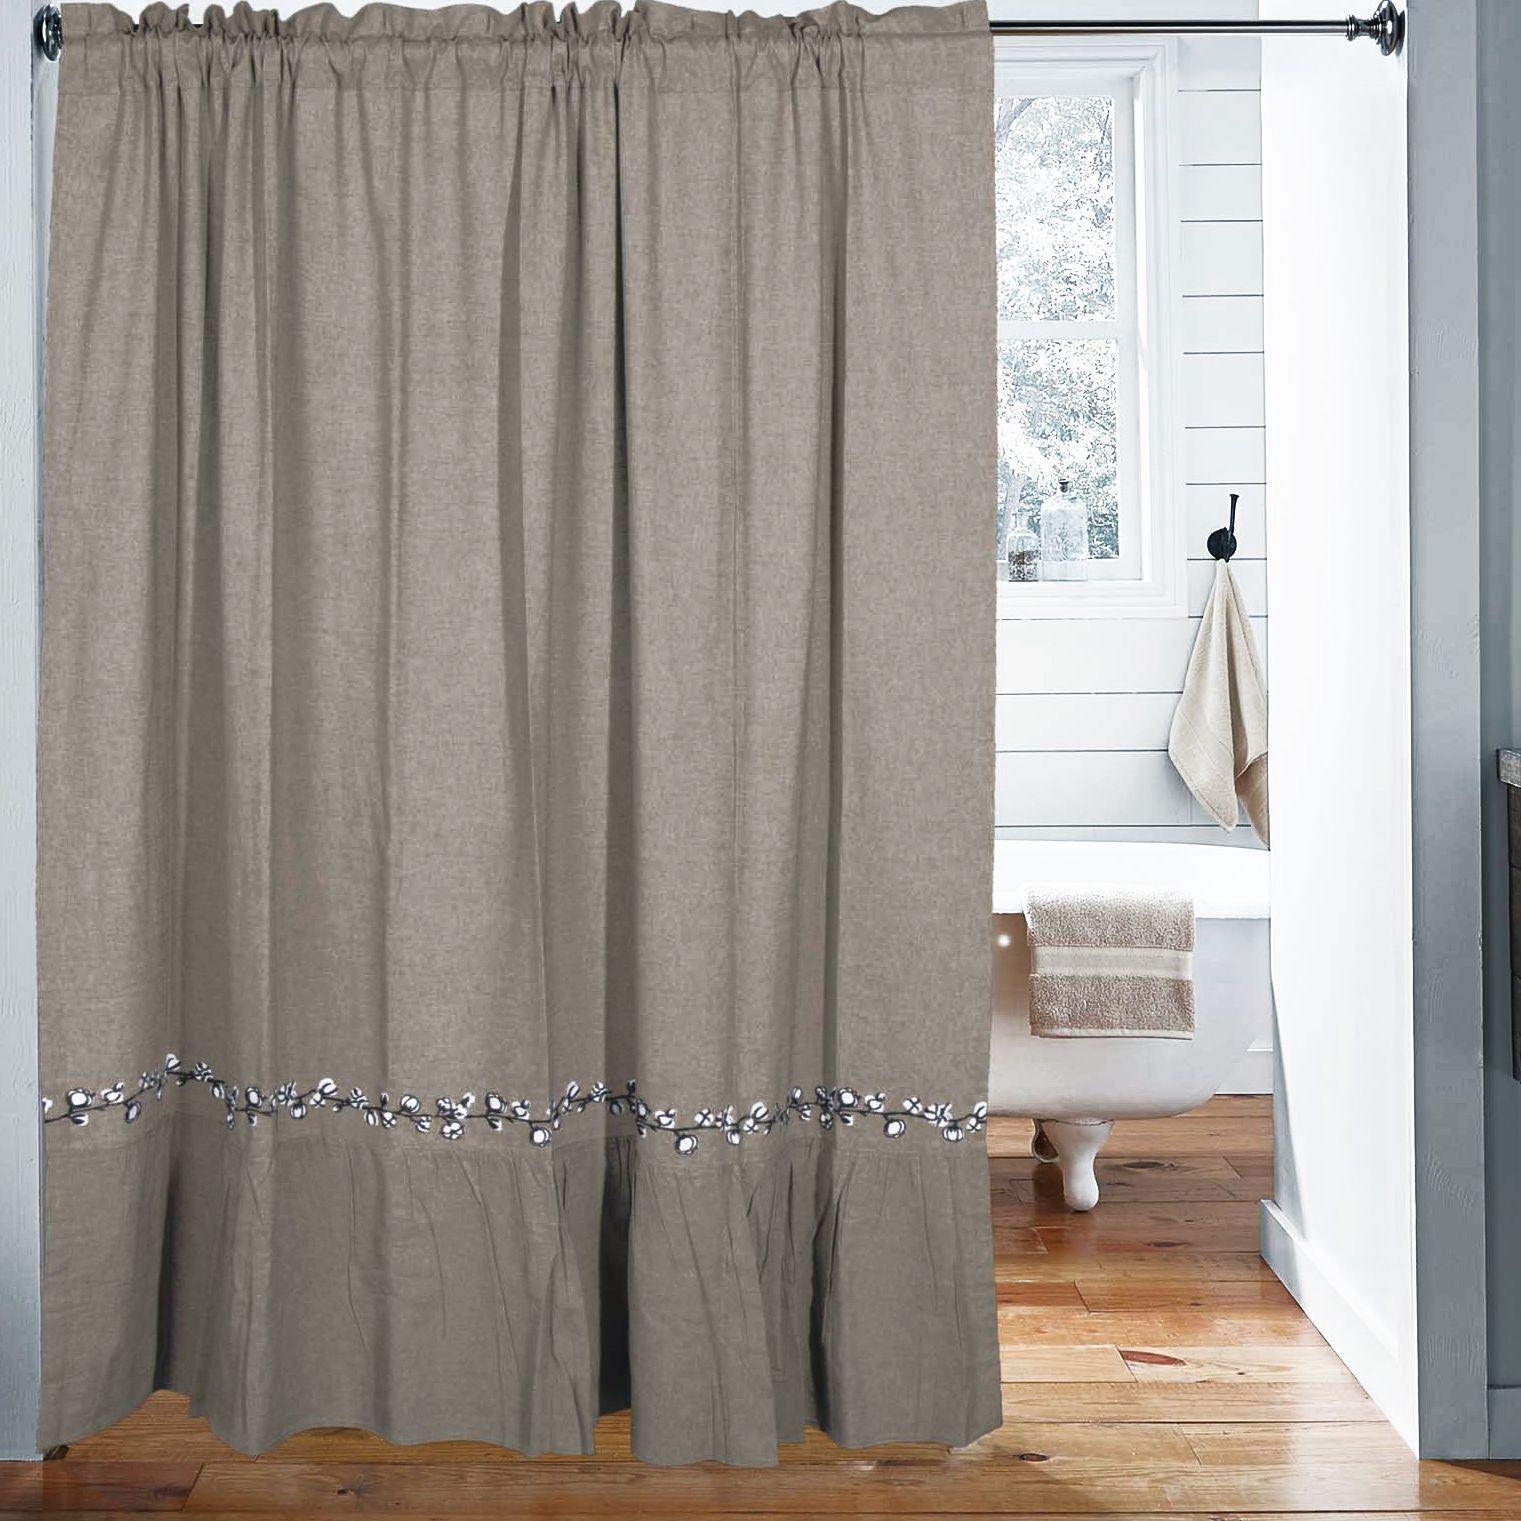 Farmhouse cotton shower curtain rustic shower curtains